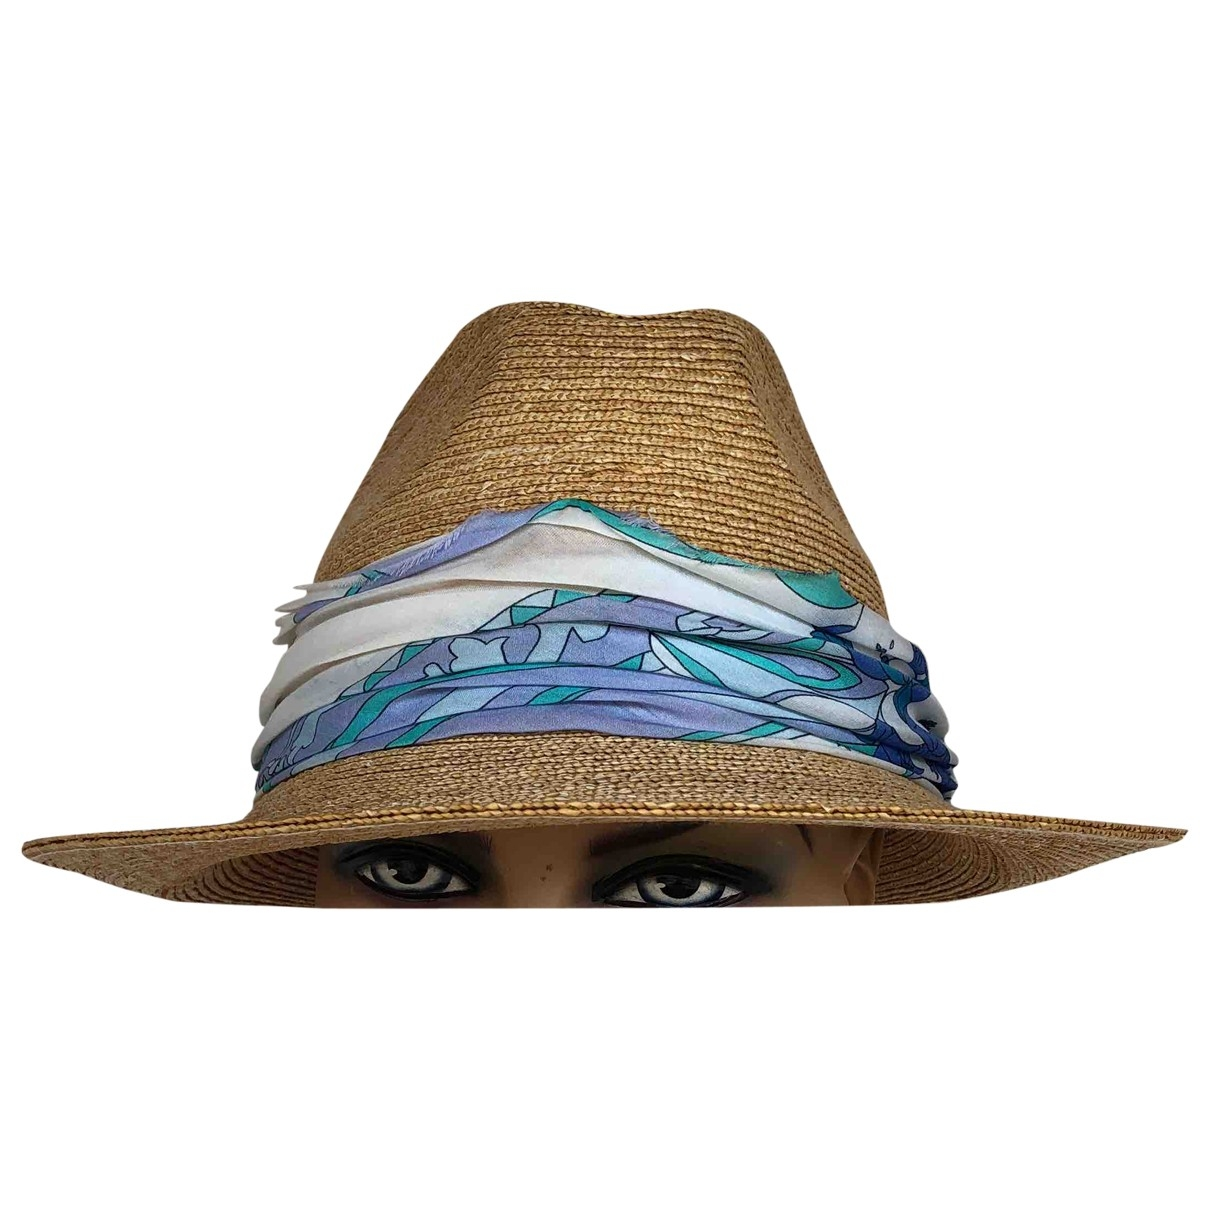 Emilio Pucci \N Beige Cloth hat for Women M International